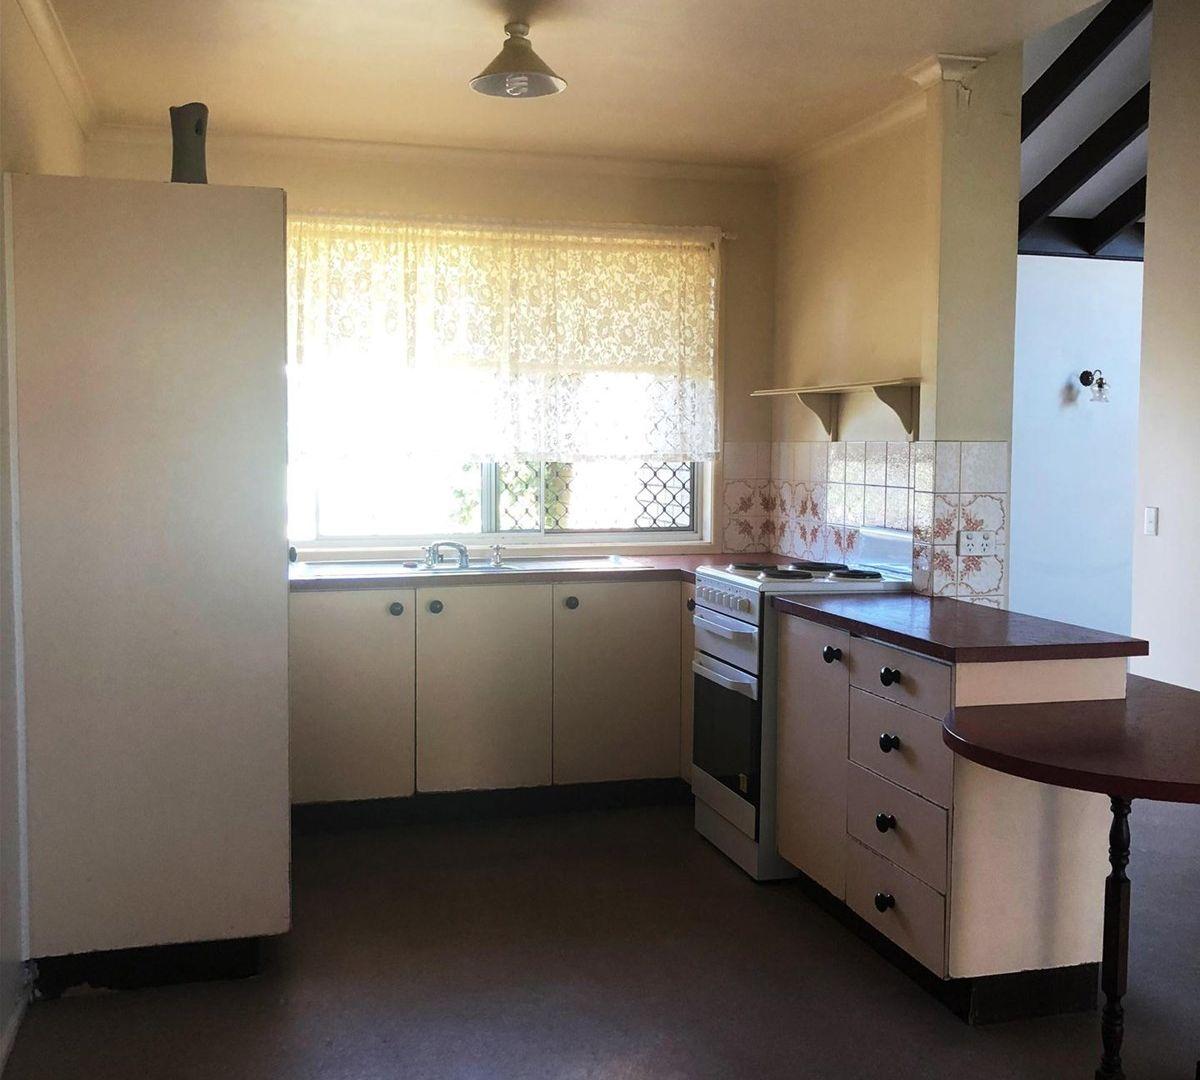 12 Kingsford Smith Drive, Wilsonton QLD 4350, Image 1